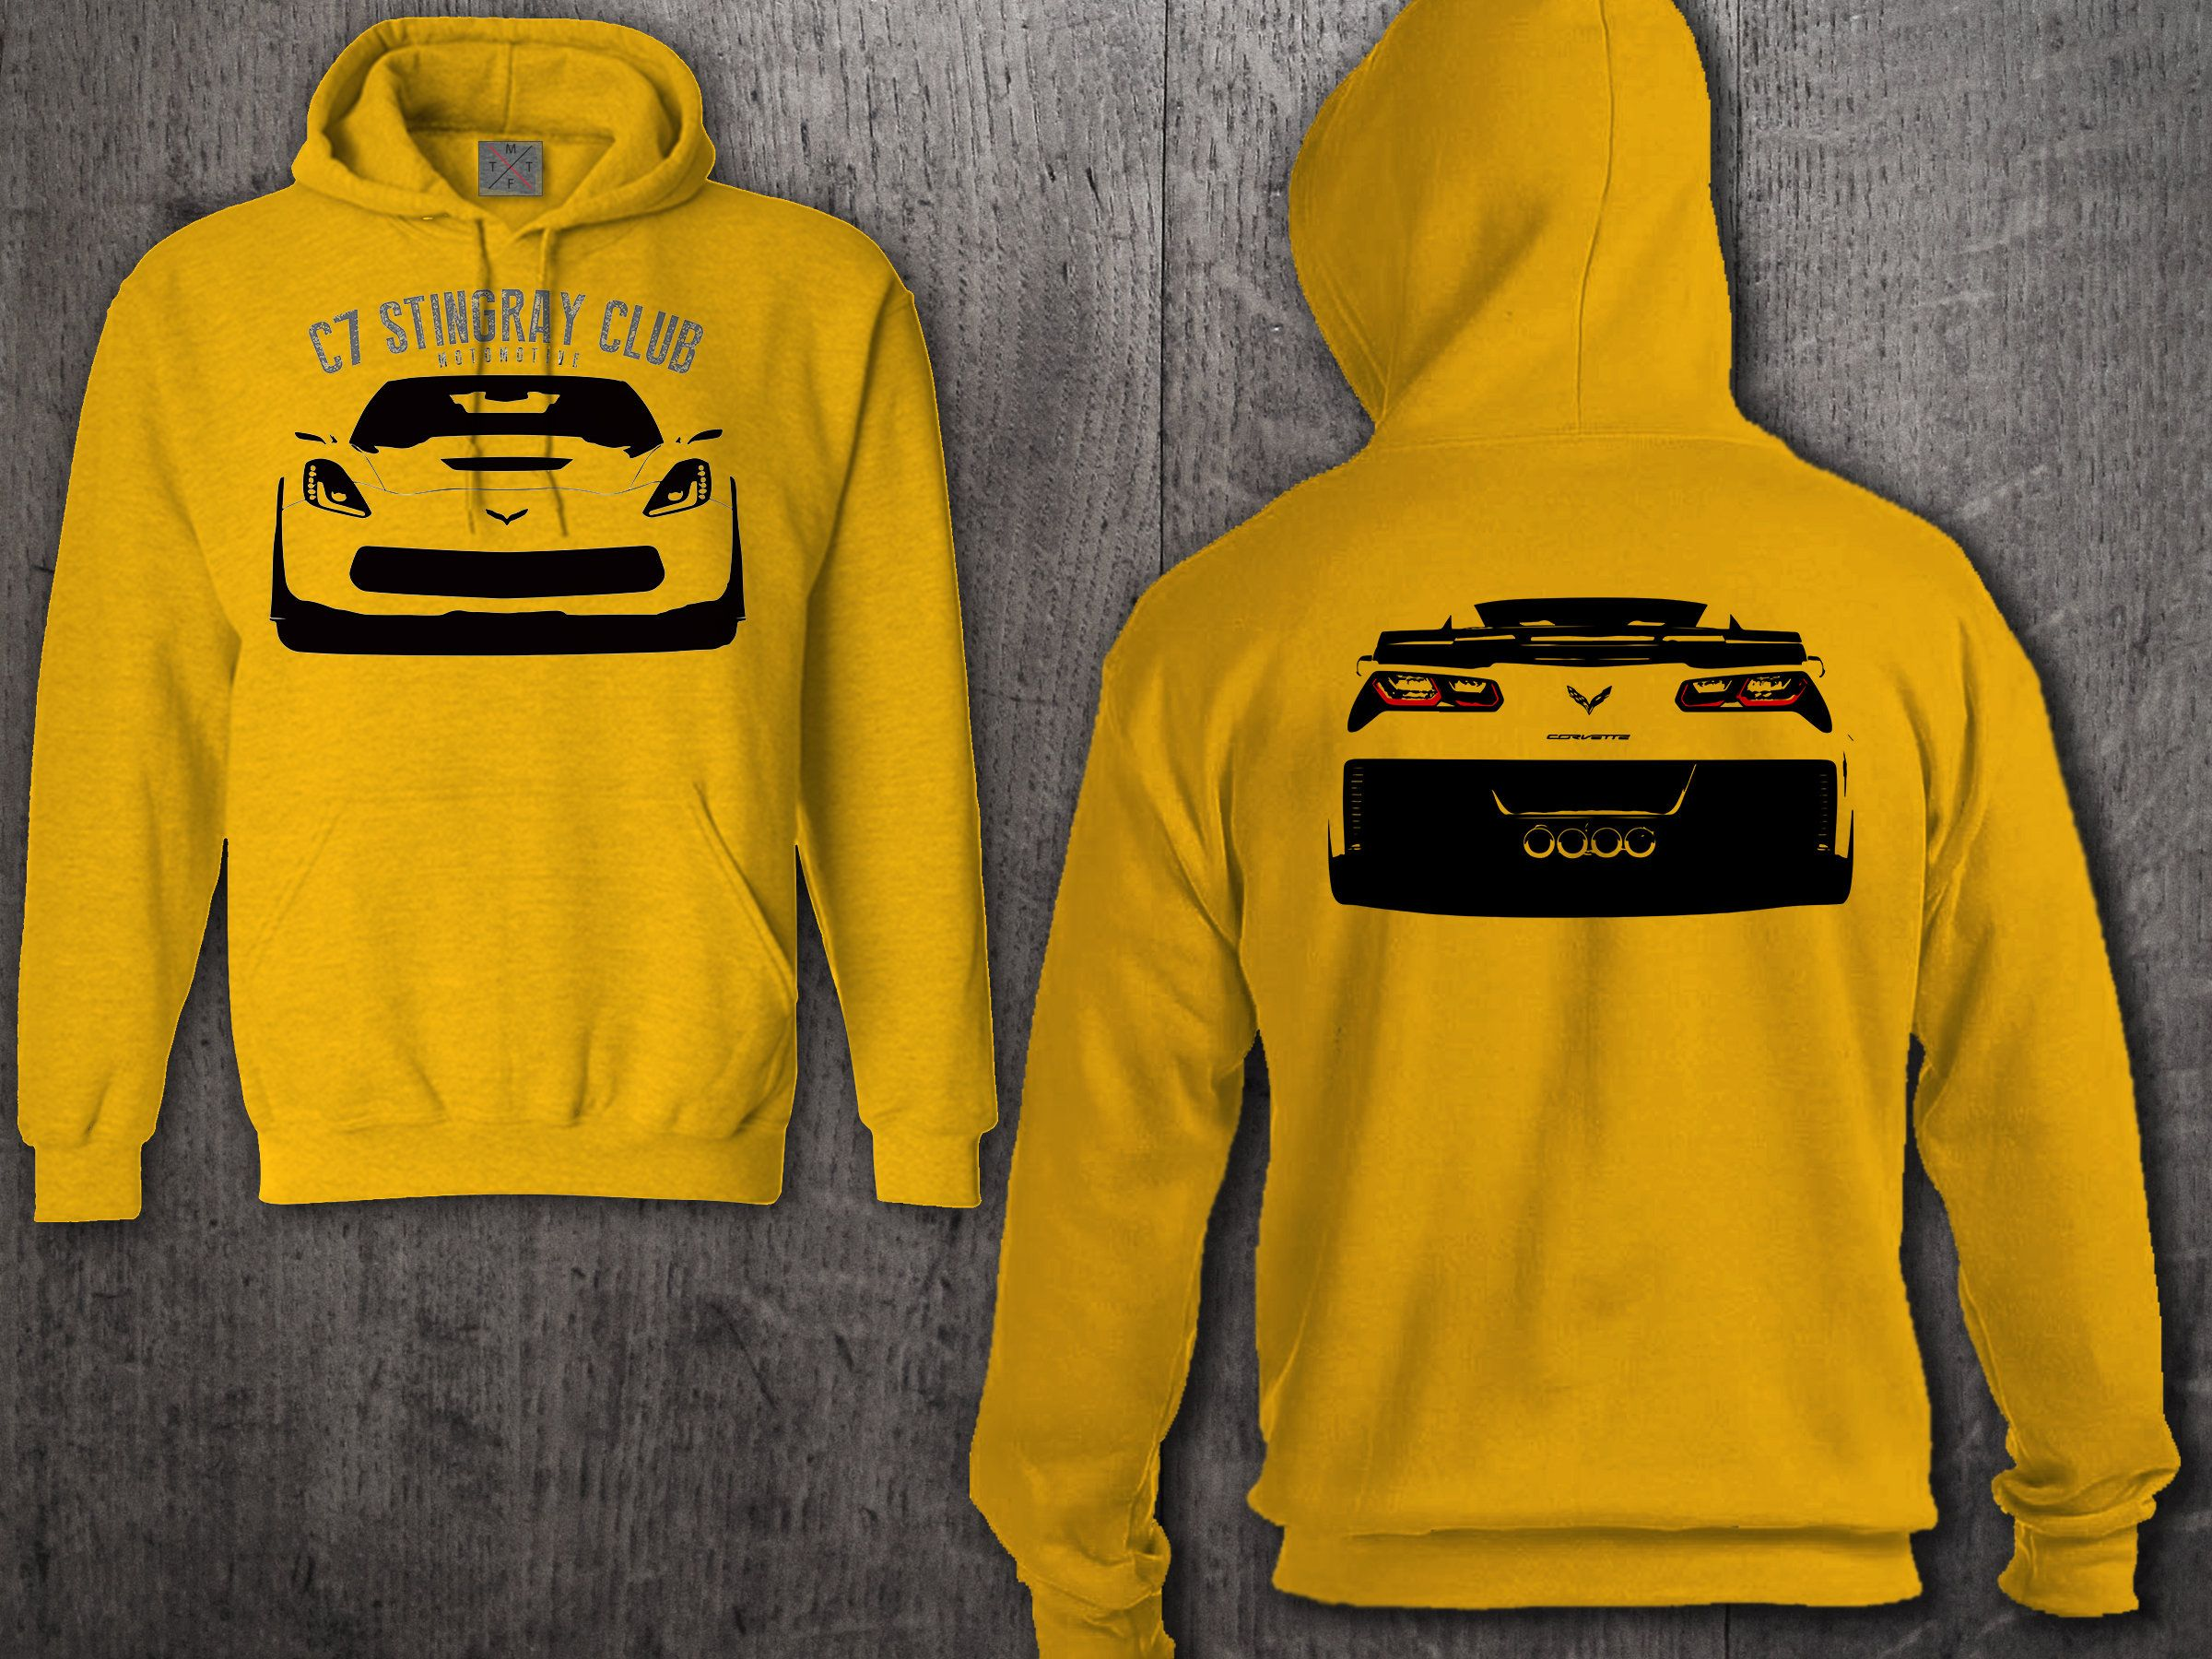 Corvette Stingray Hoodie Cars Hoodies Chevy Corvette Hoodies Corvette Sweaters Men Hoodies Cars T Shirts Unisex Hoodies Best Quality T Shirts Hoodies Men [ 1800 x 2400 Pixel ]